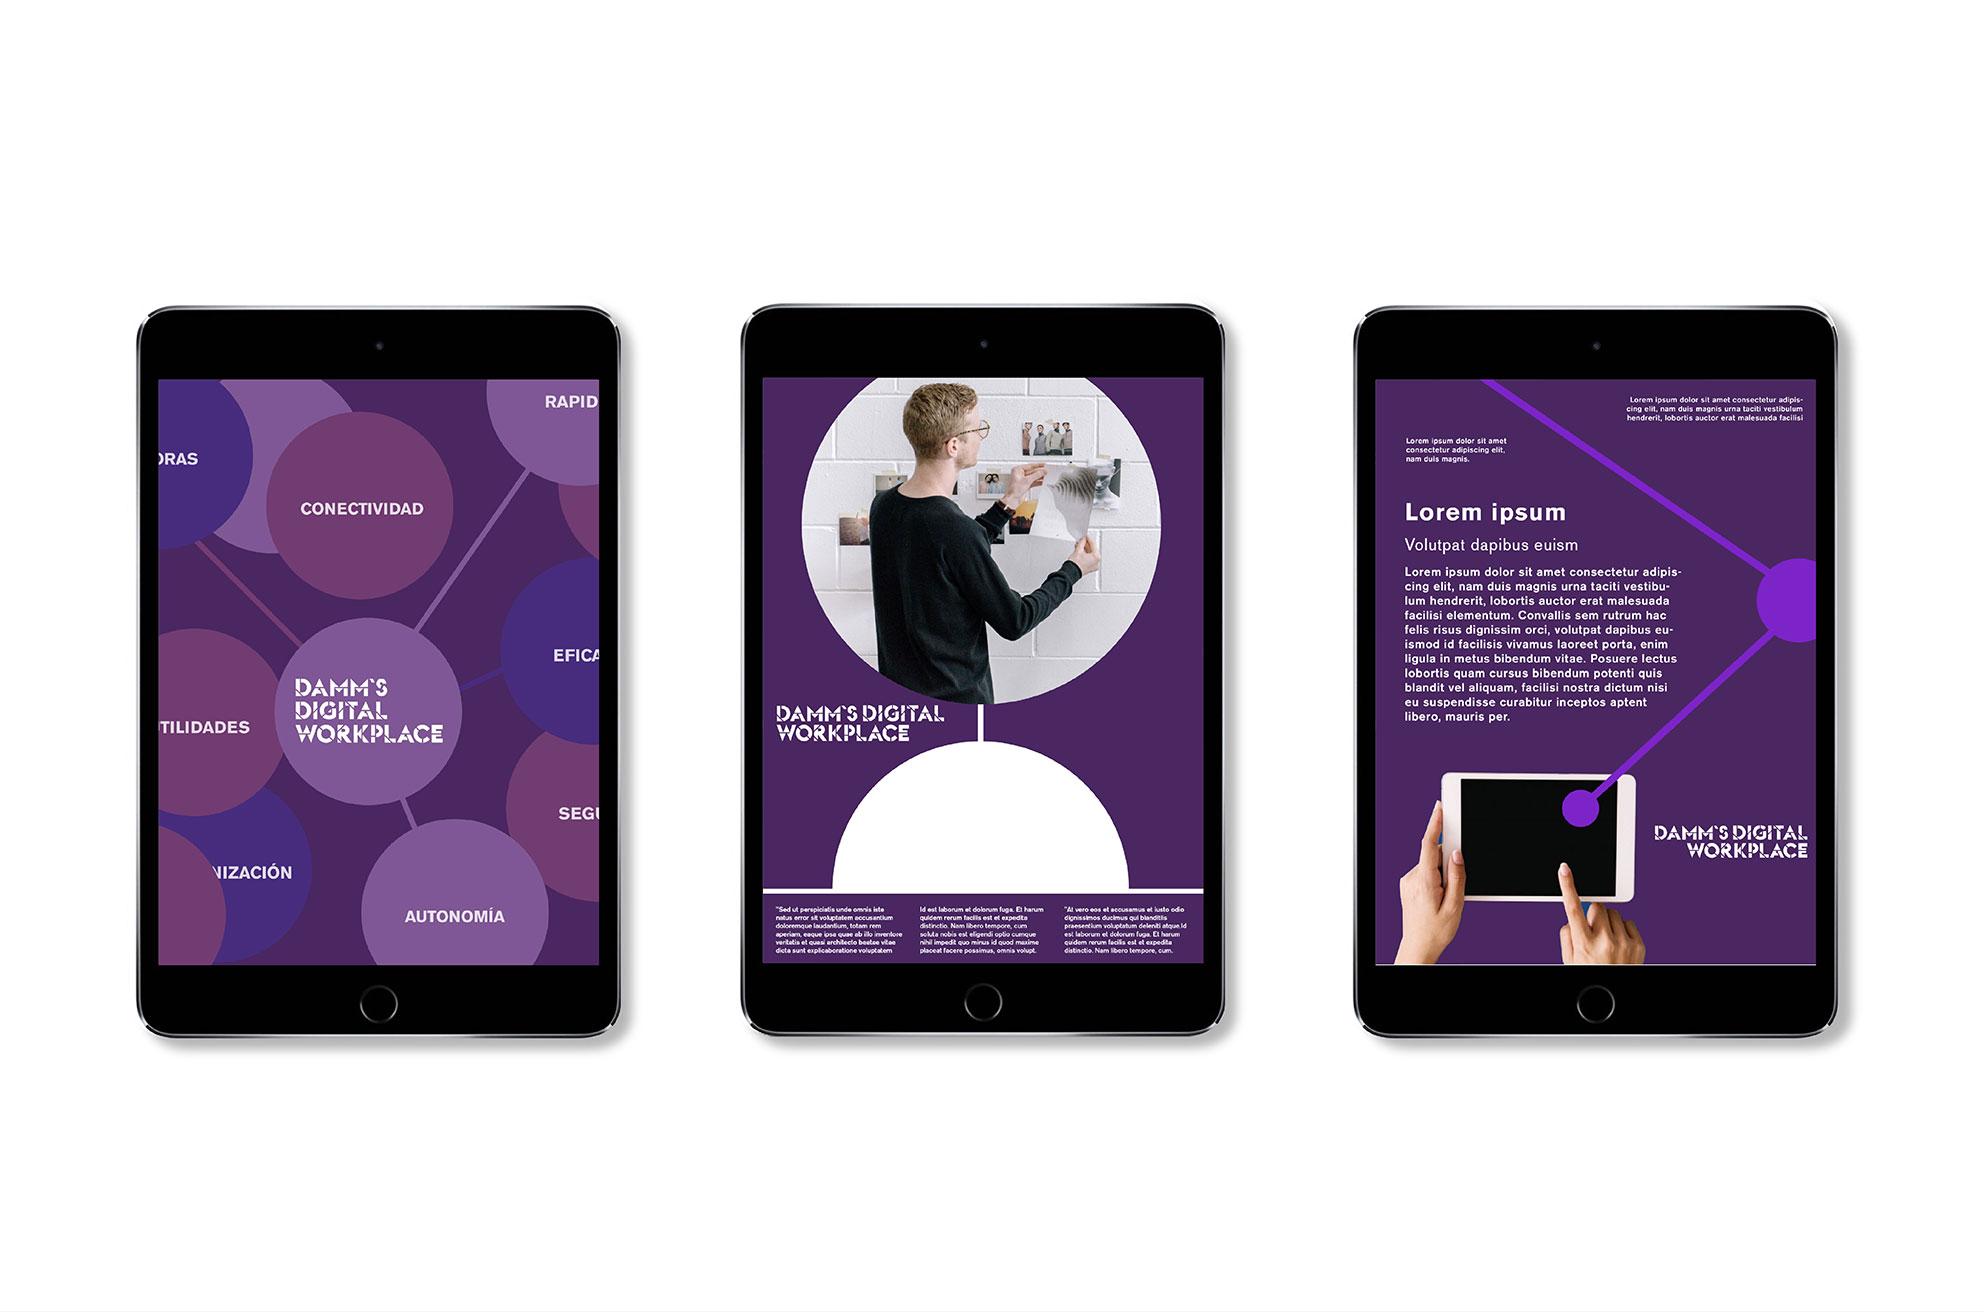 Damm-Digital-Workplace-Damm-diseñografico-agencia-barcelona-4